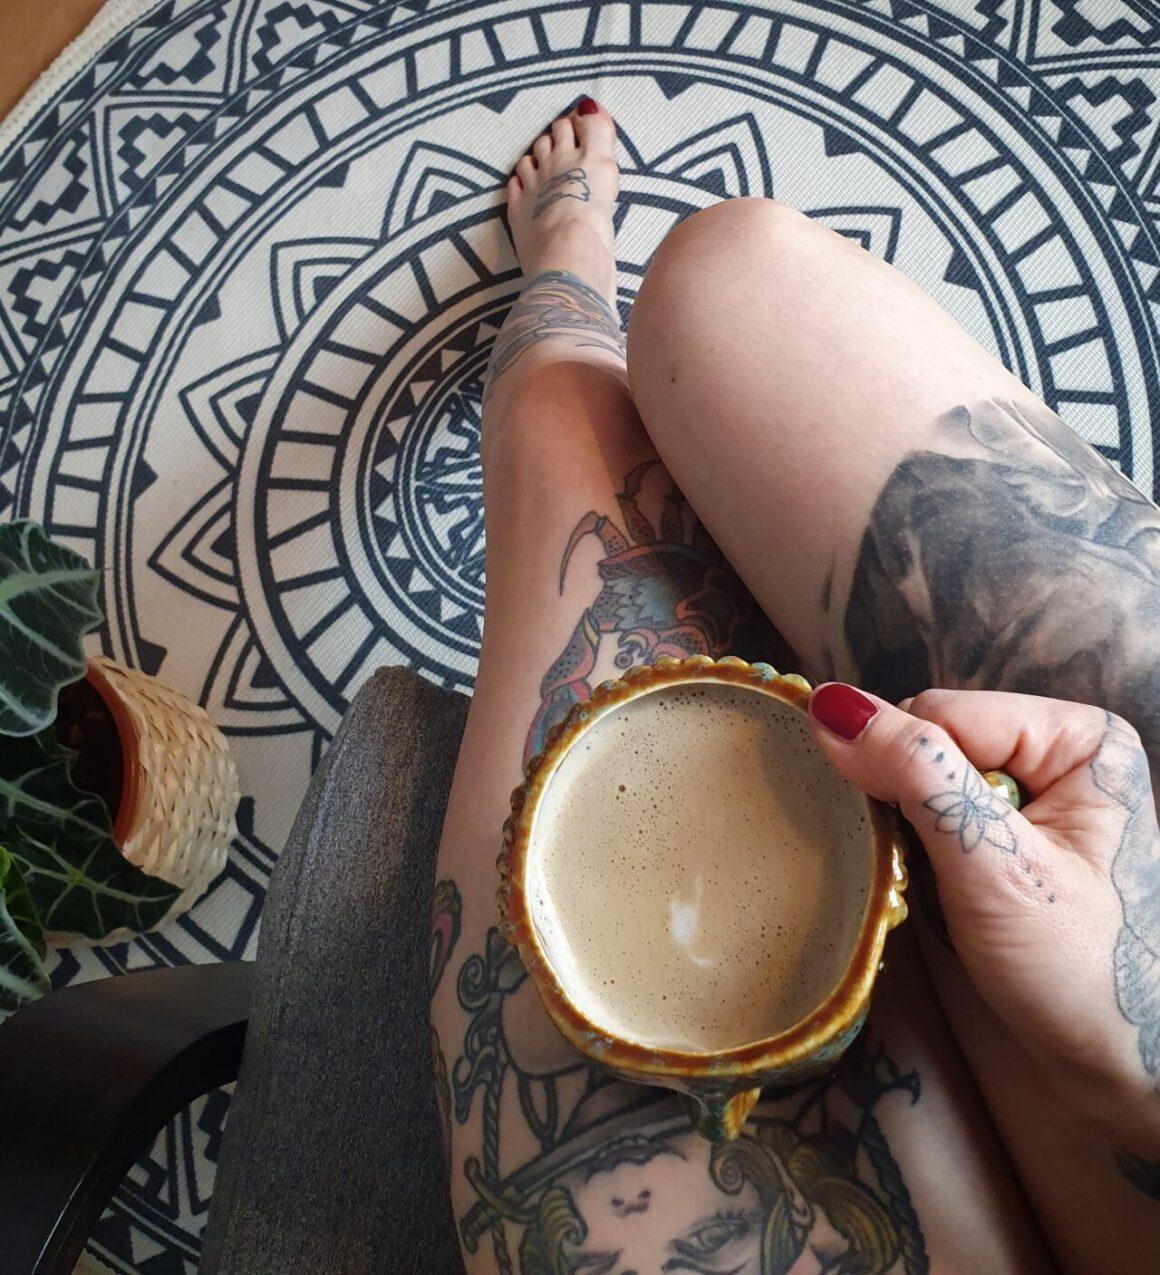 Franziska, tattoo model